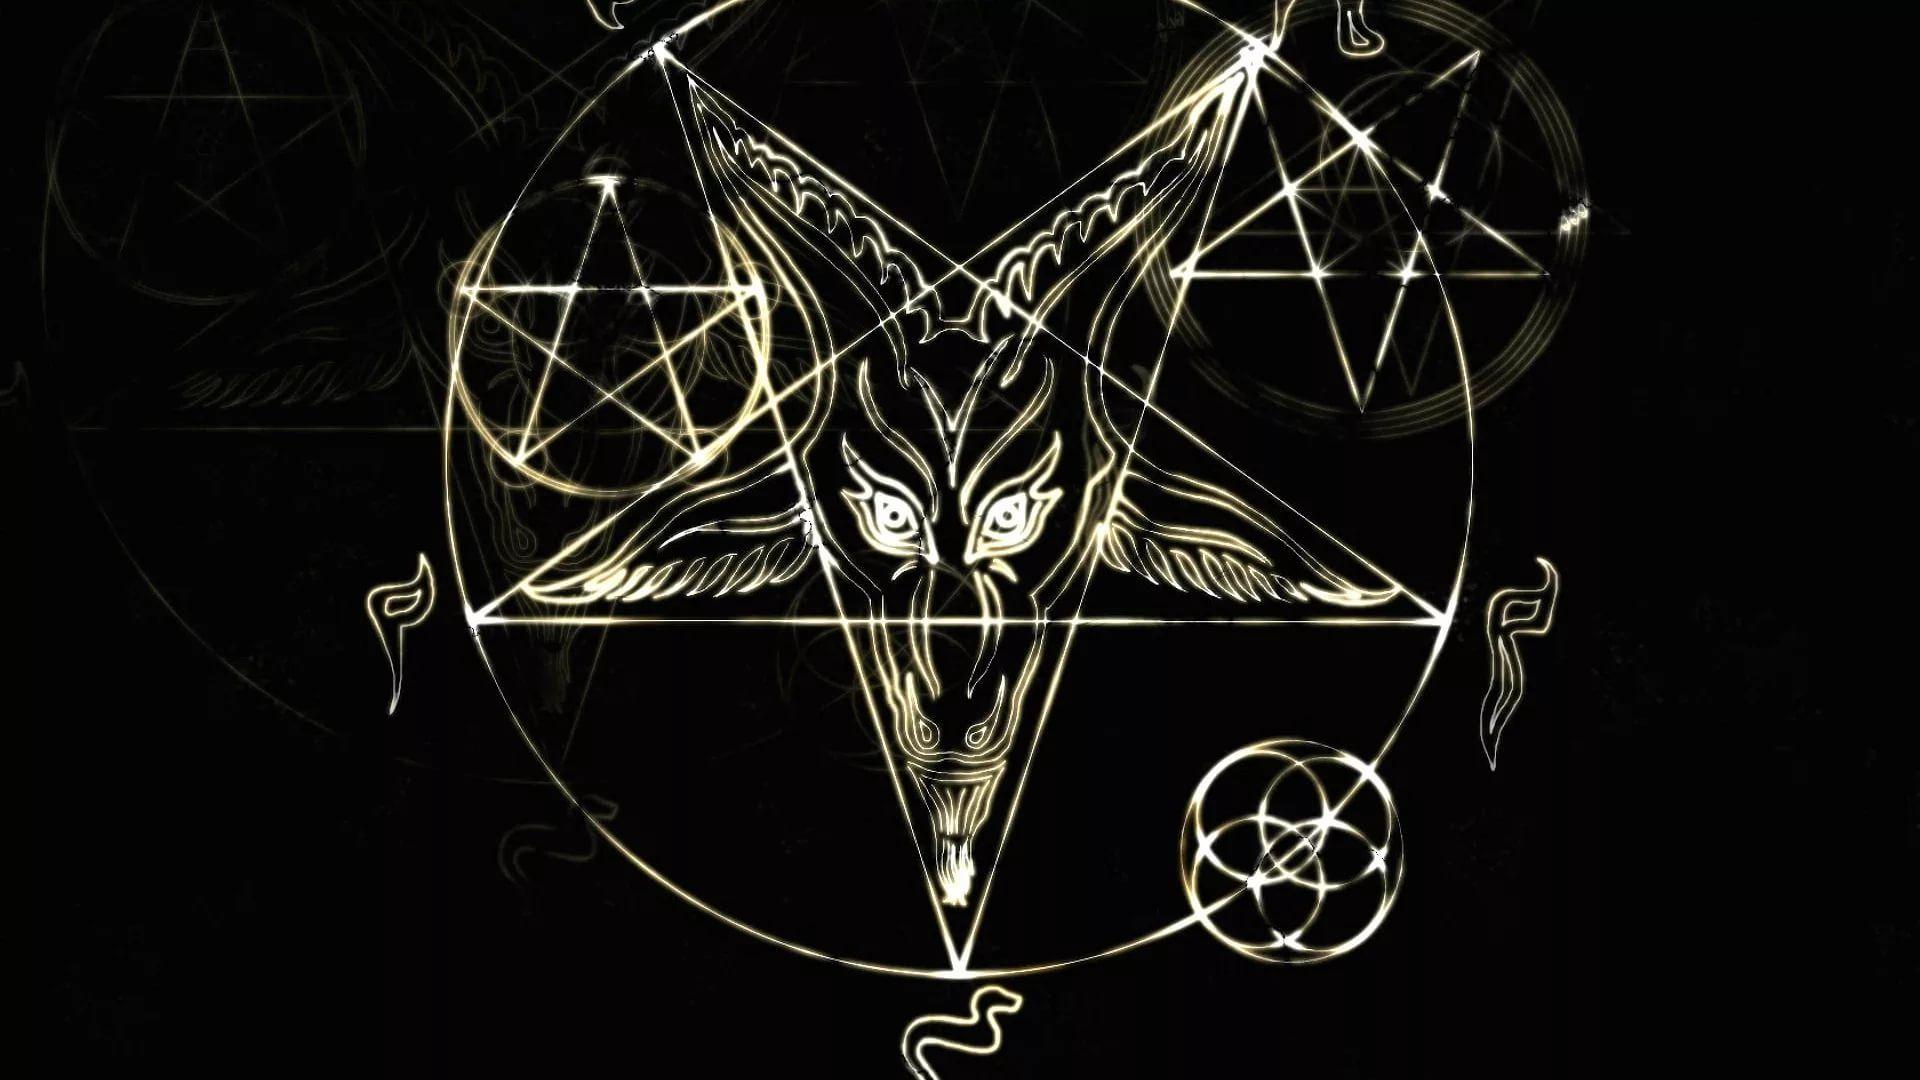 Satanic Good Wallpaper